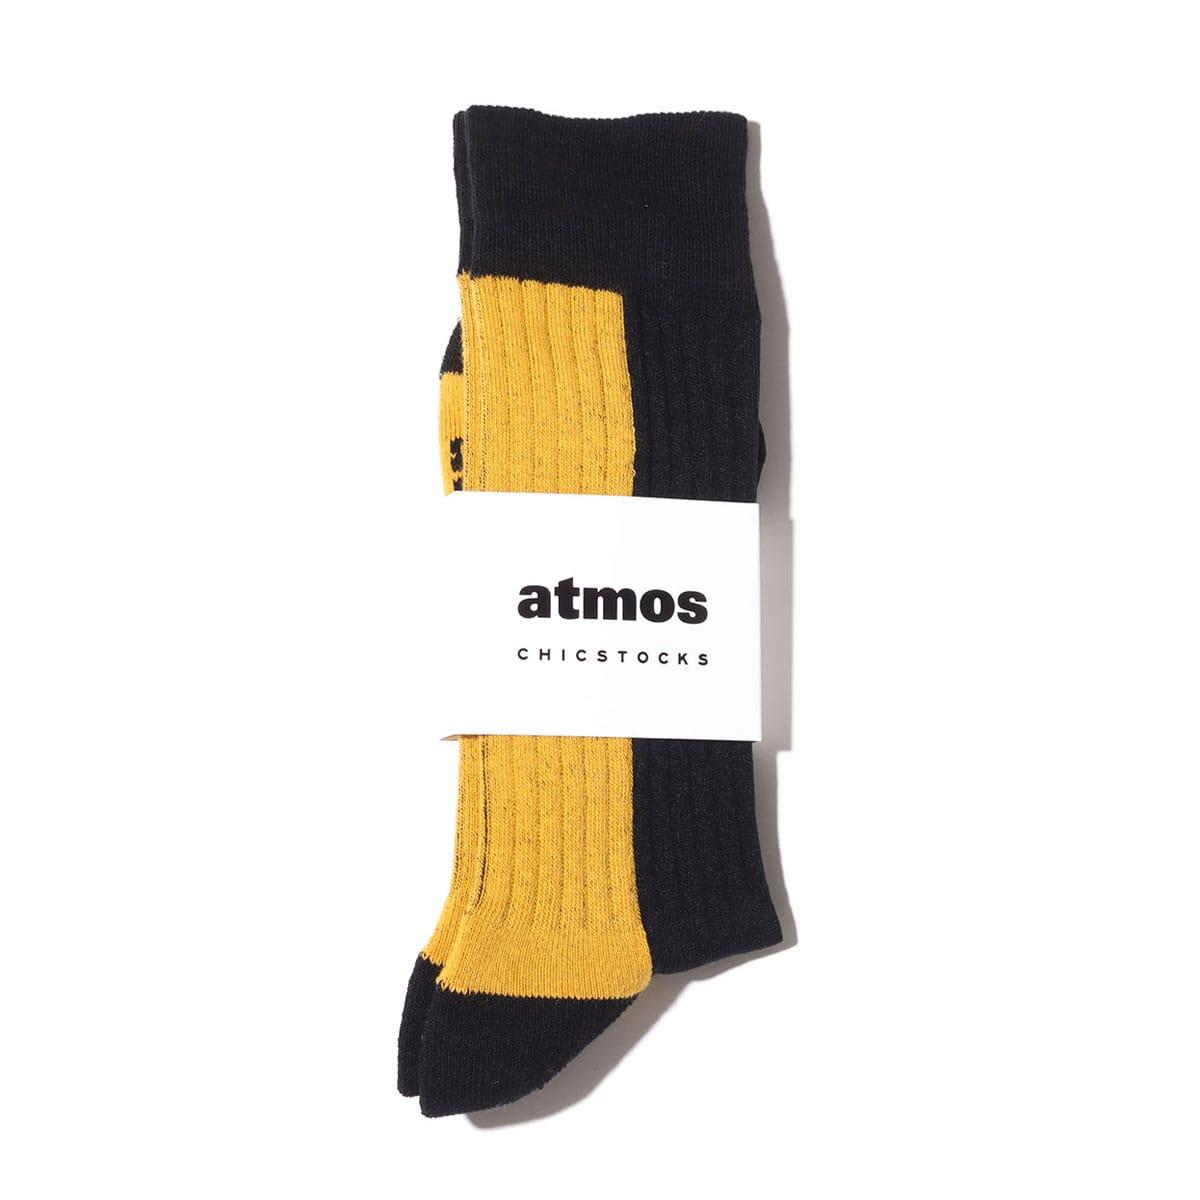 atmos x CHICSTOCKS 1985 RIB SOCKS BLACK / YELLOW 21SP-S_photo_large